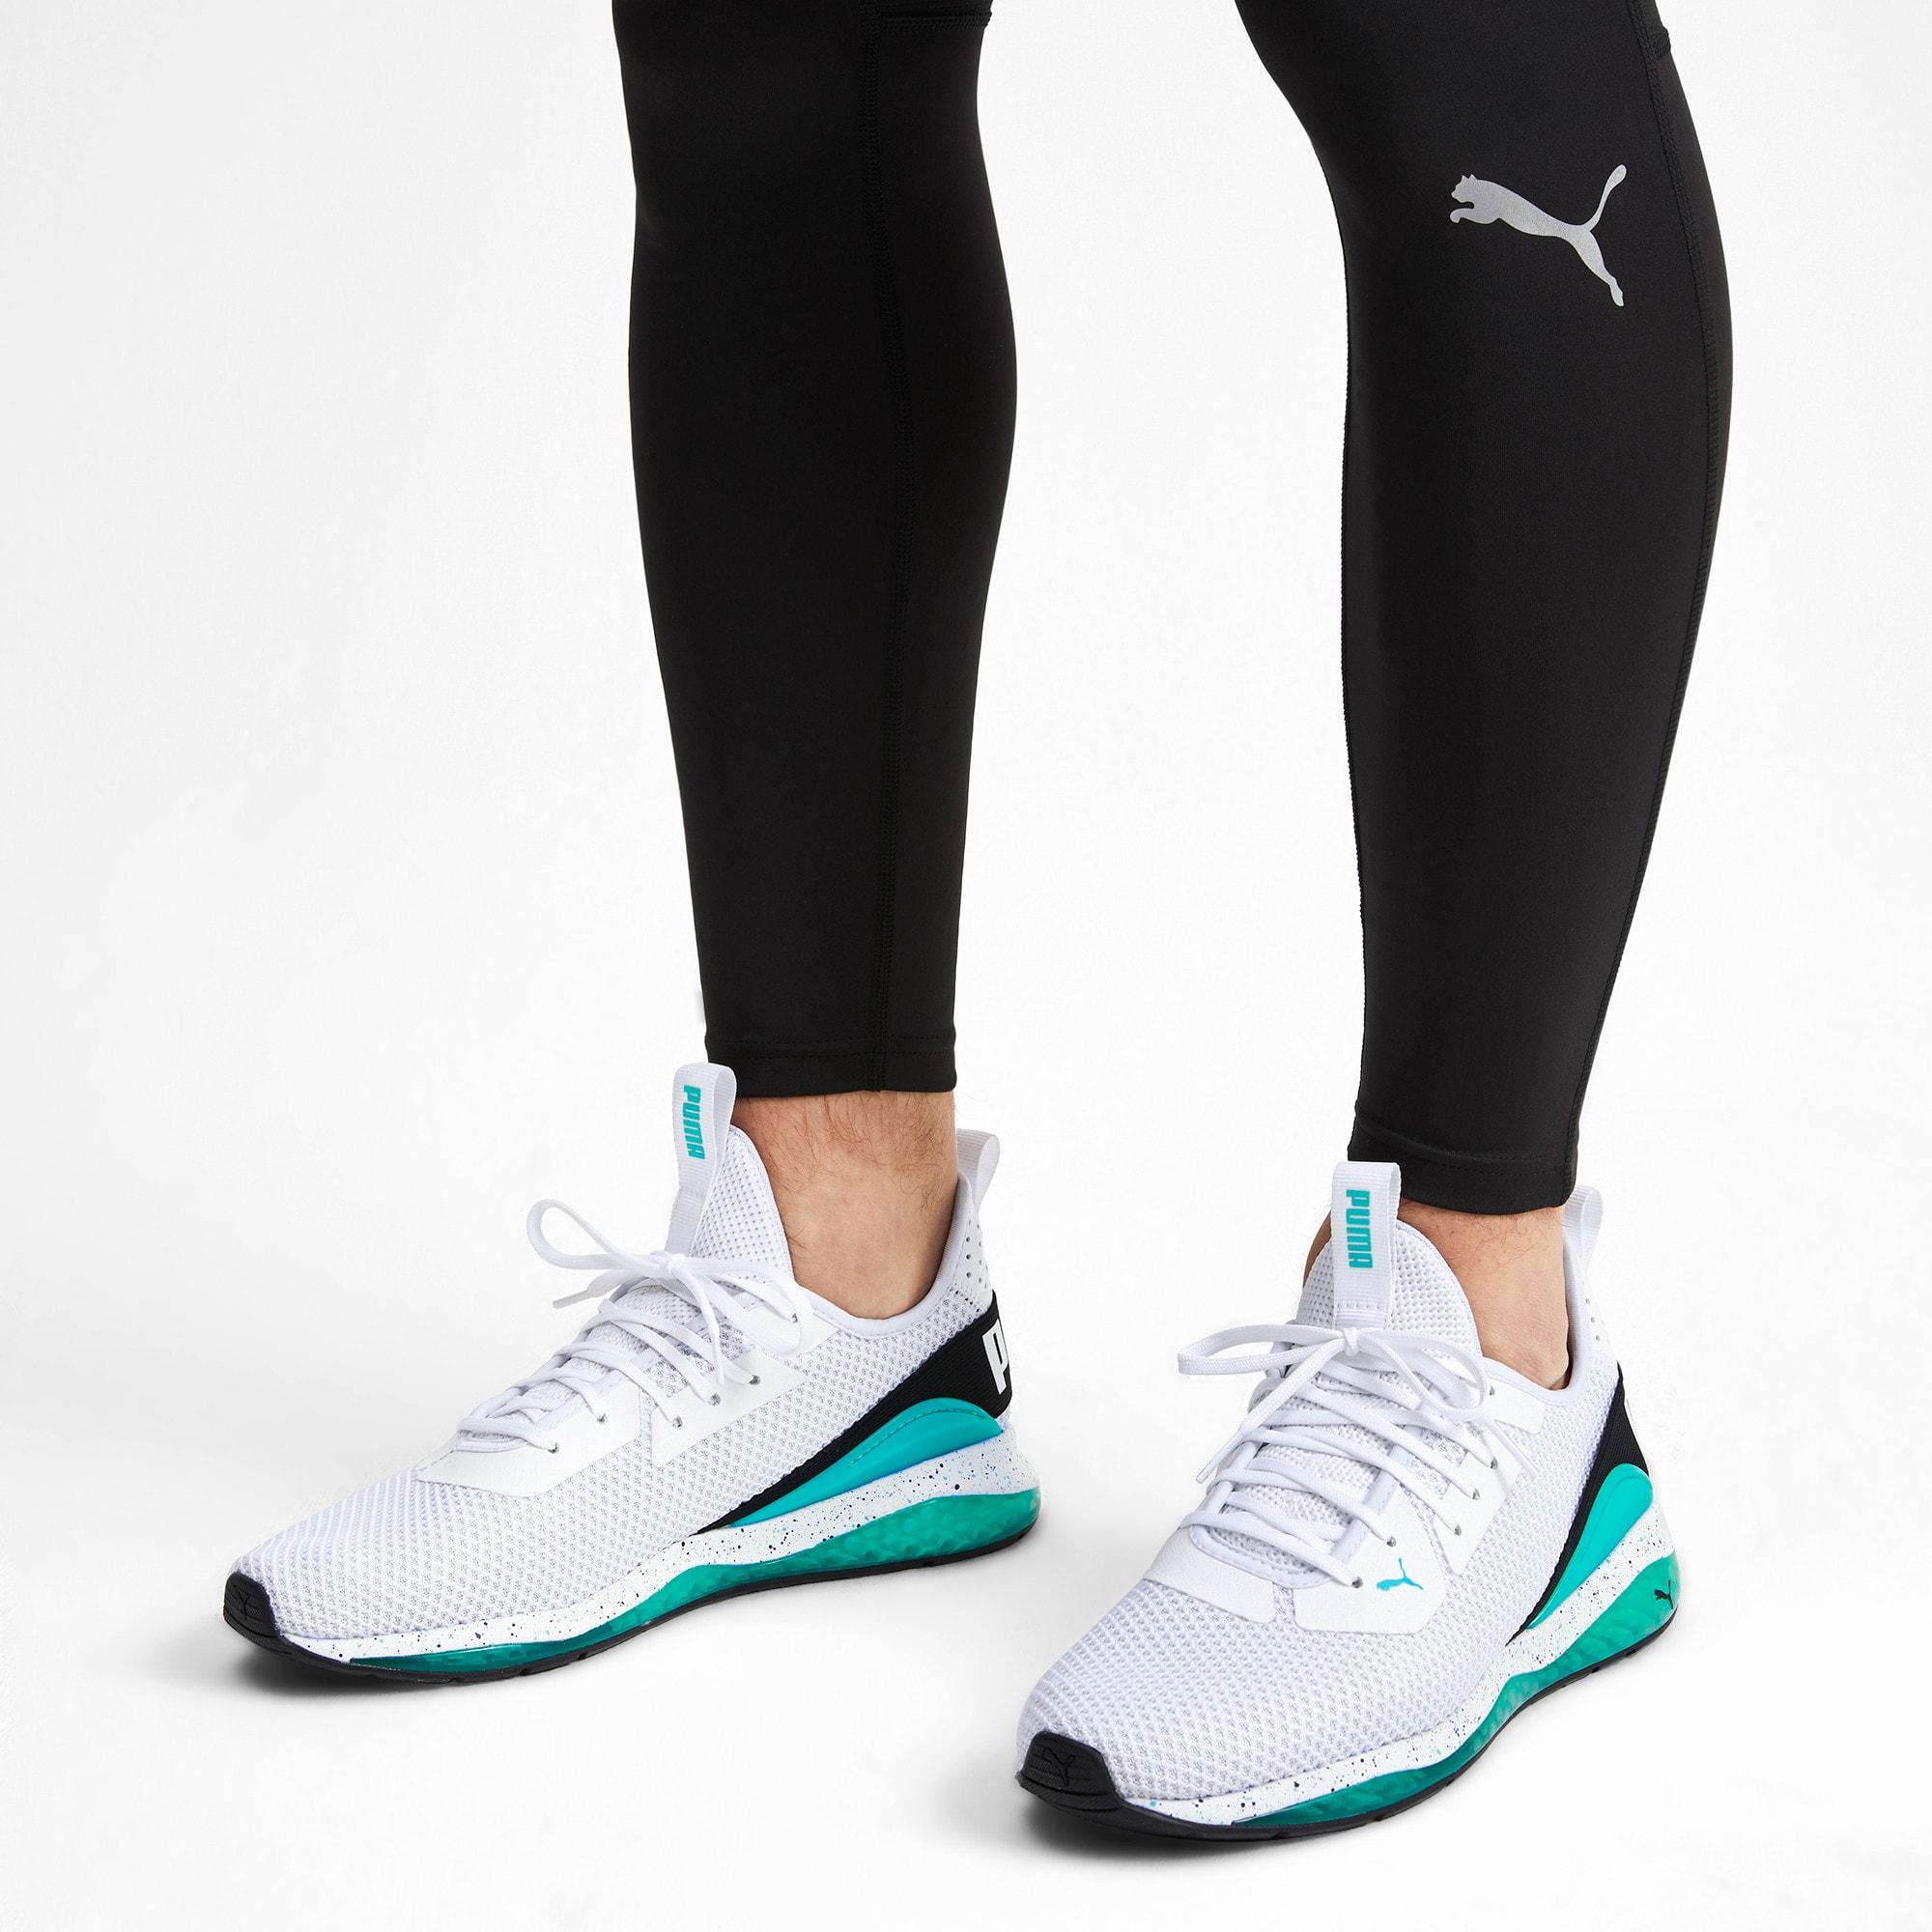 Miniatura 3 de Zapatos de entrenamiento CELL Descend Weave para hombre, White-Black-Blue Turquoise, mediano